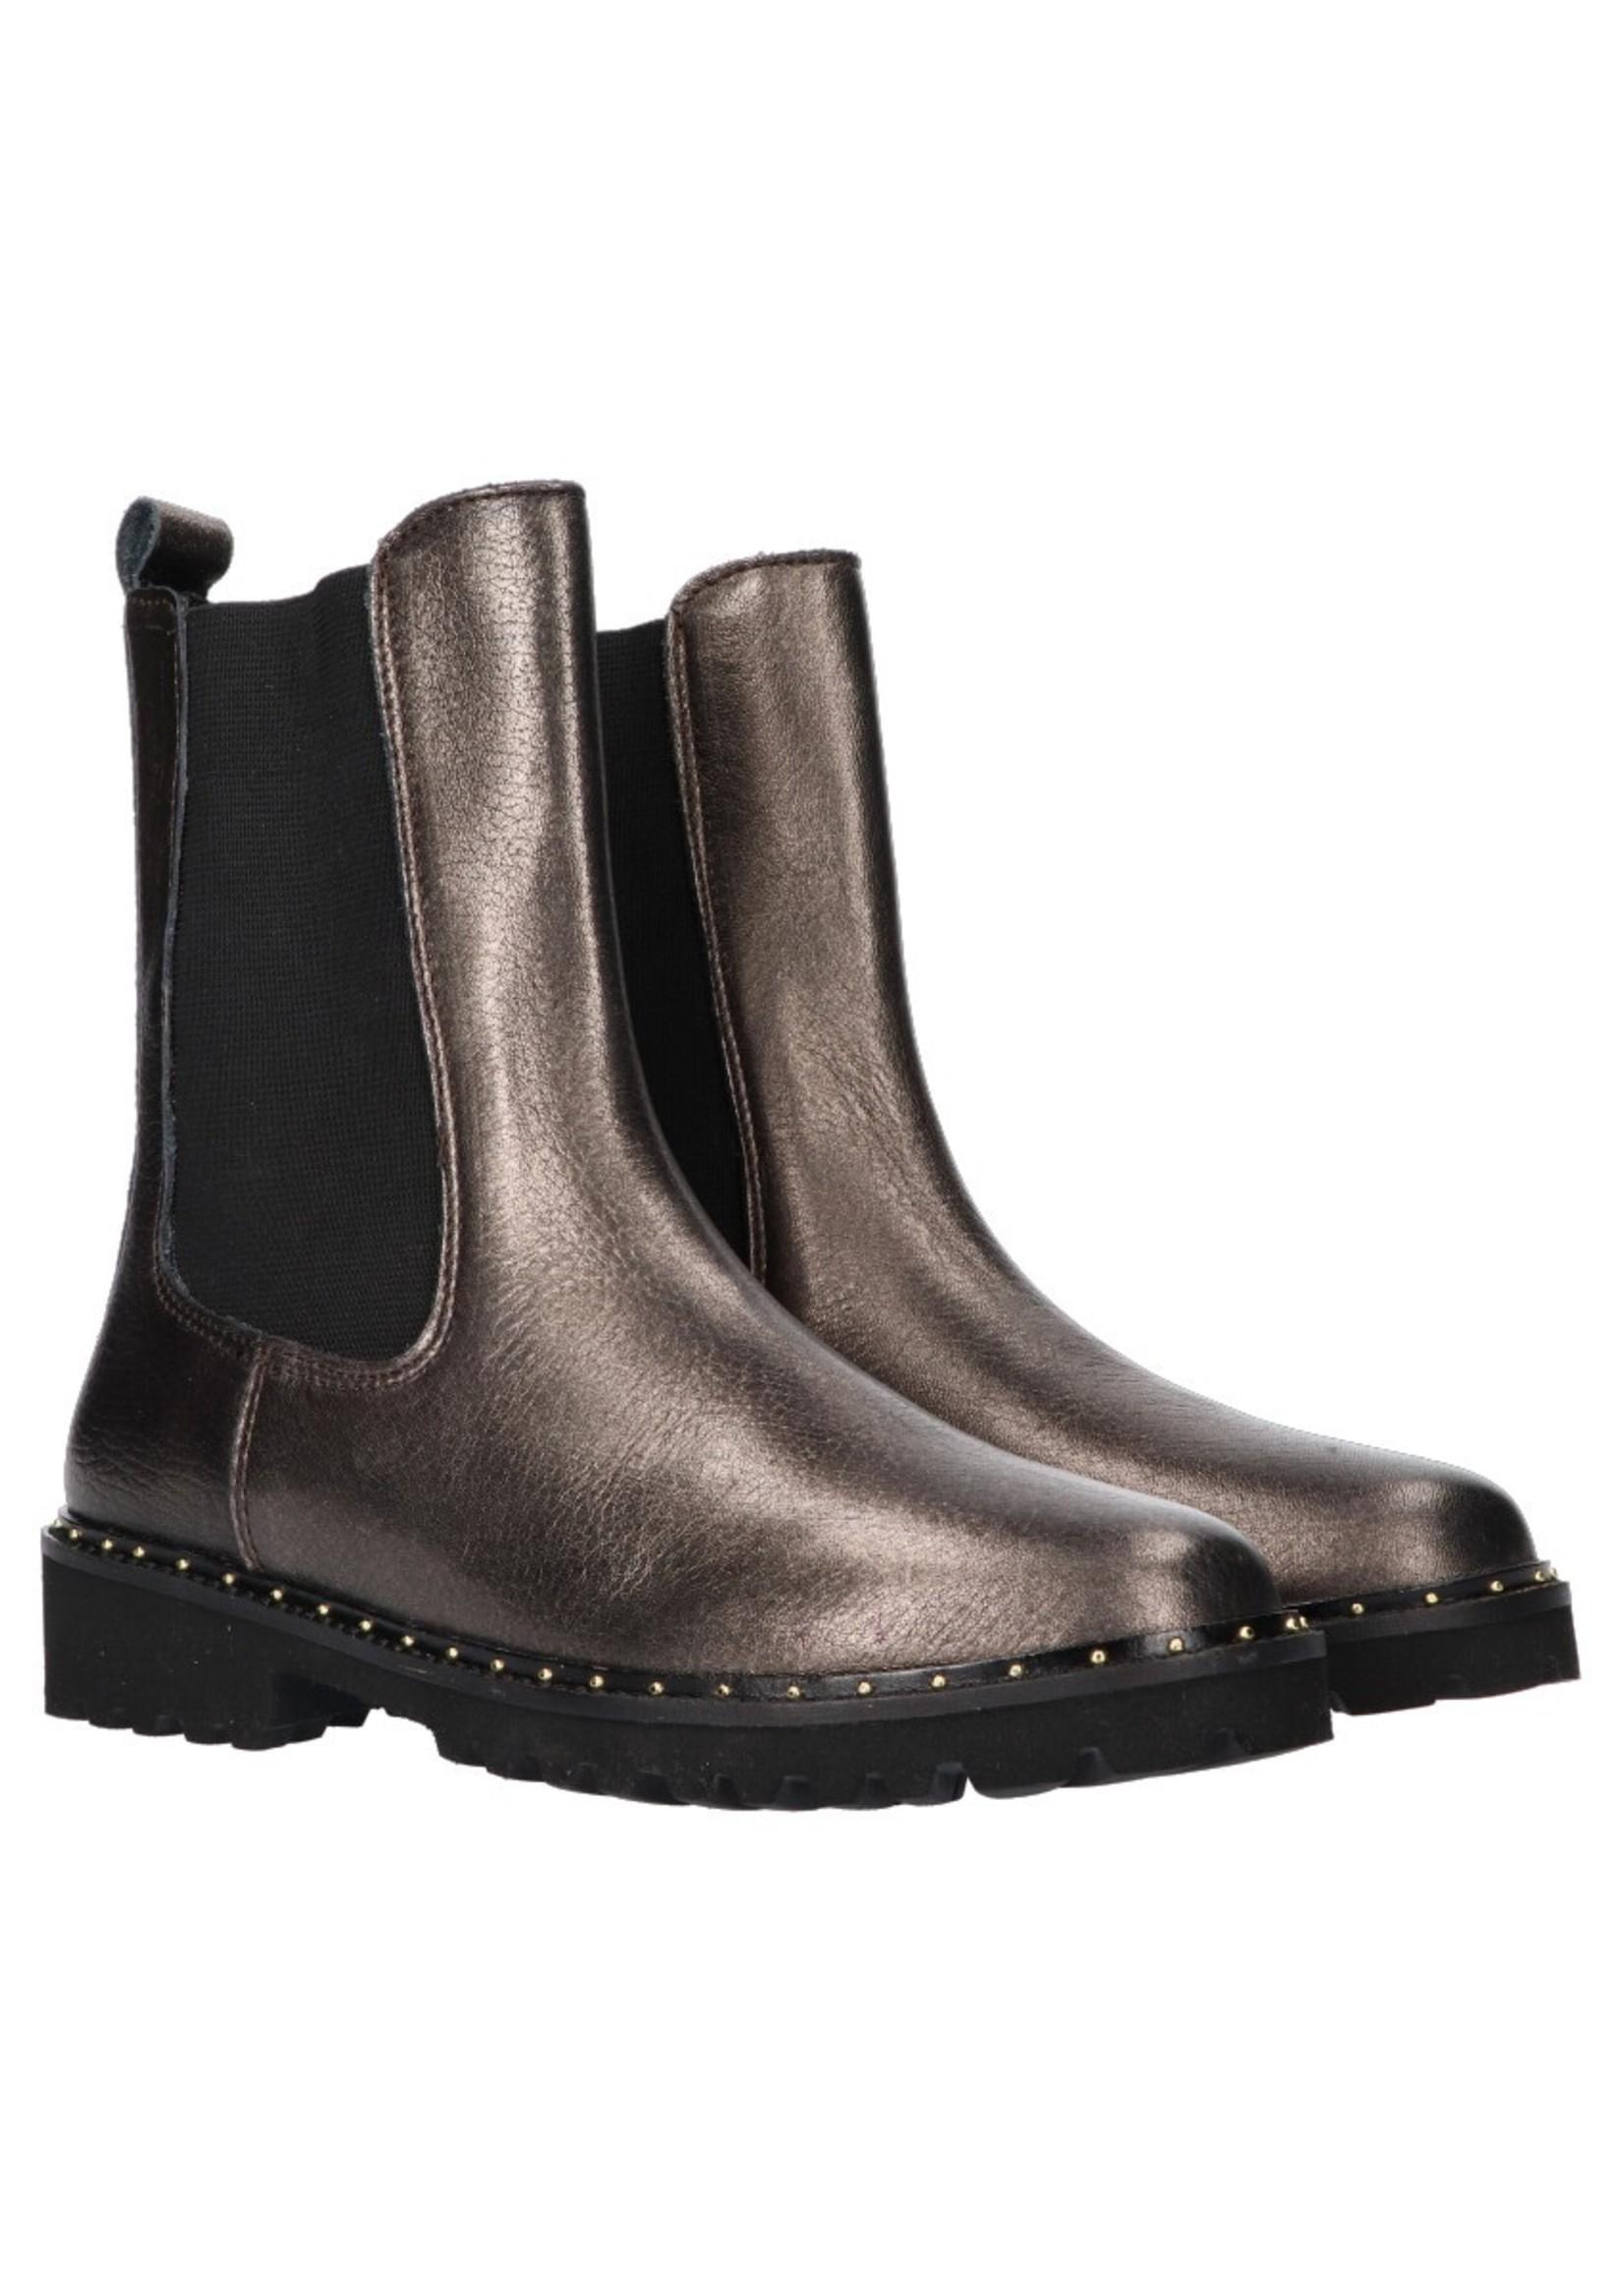 Tango Shoes Tango Bee Bold Metallic